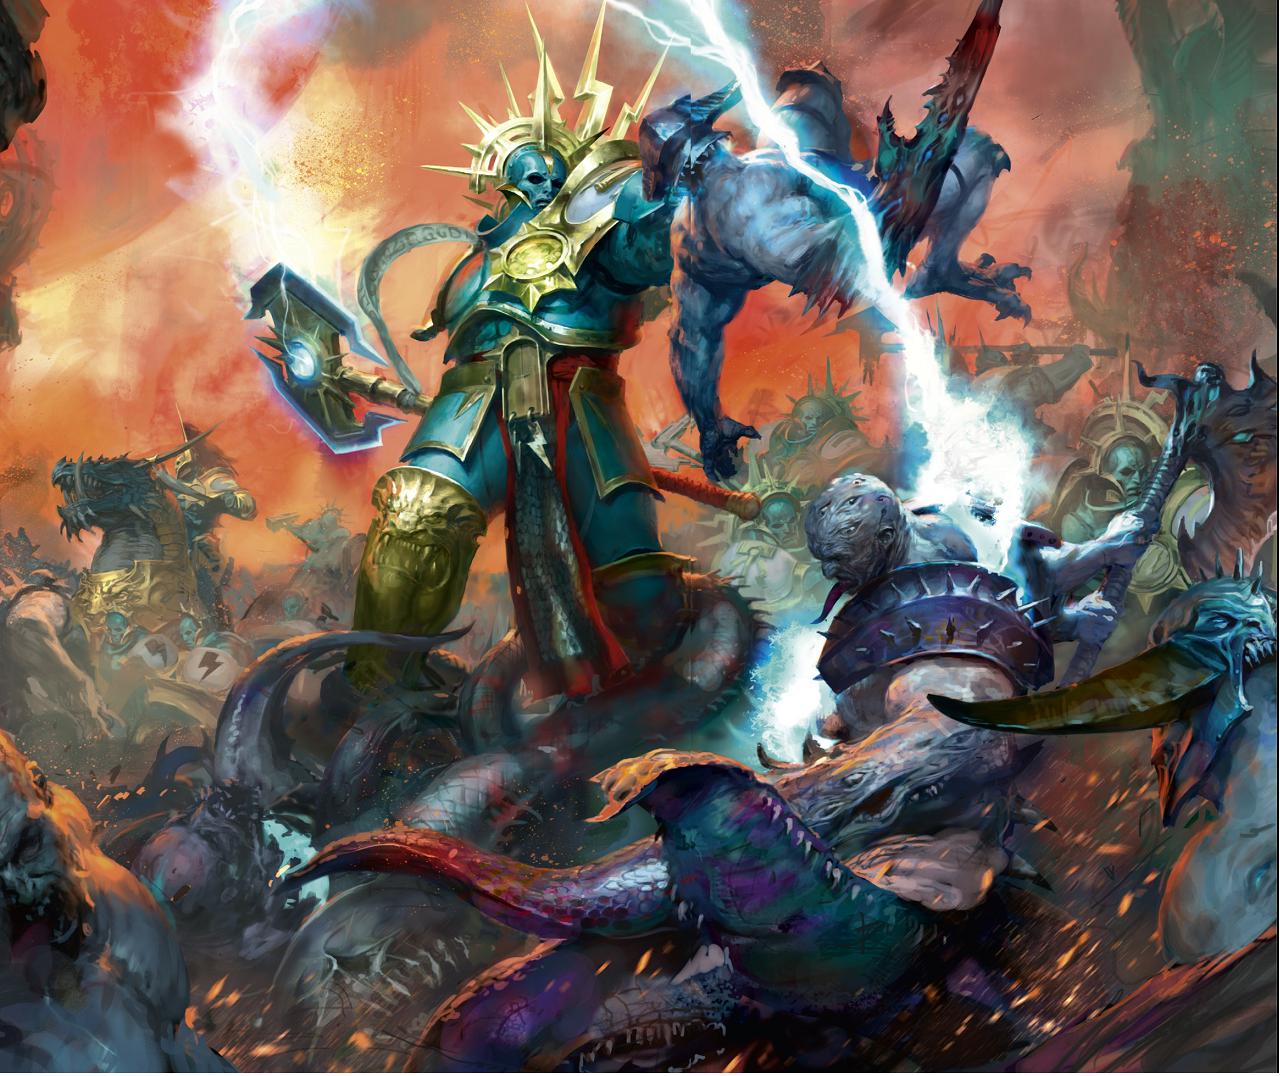 http://wellofeternitypl.blogspot.com/ Age of Sigmar Artwork | Stormcast  Eternals vs Tzeentch followers #ar… | Warhammer fantasy, Warhammer,  Warhammer fantasy battle